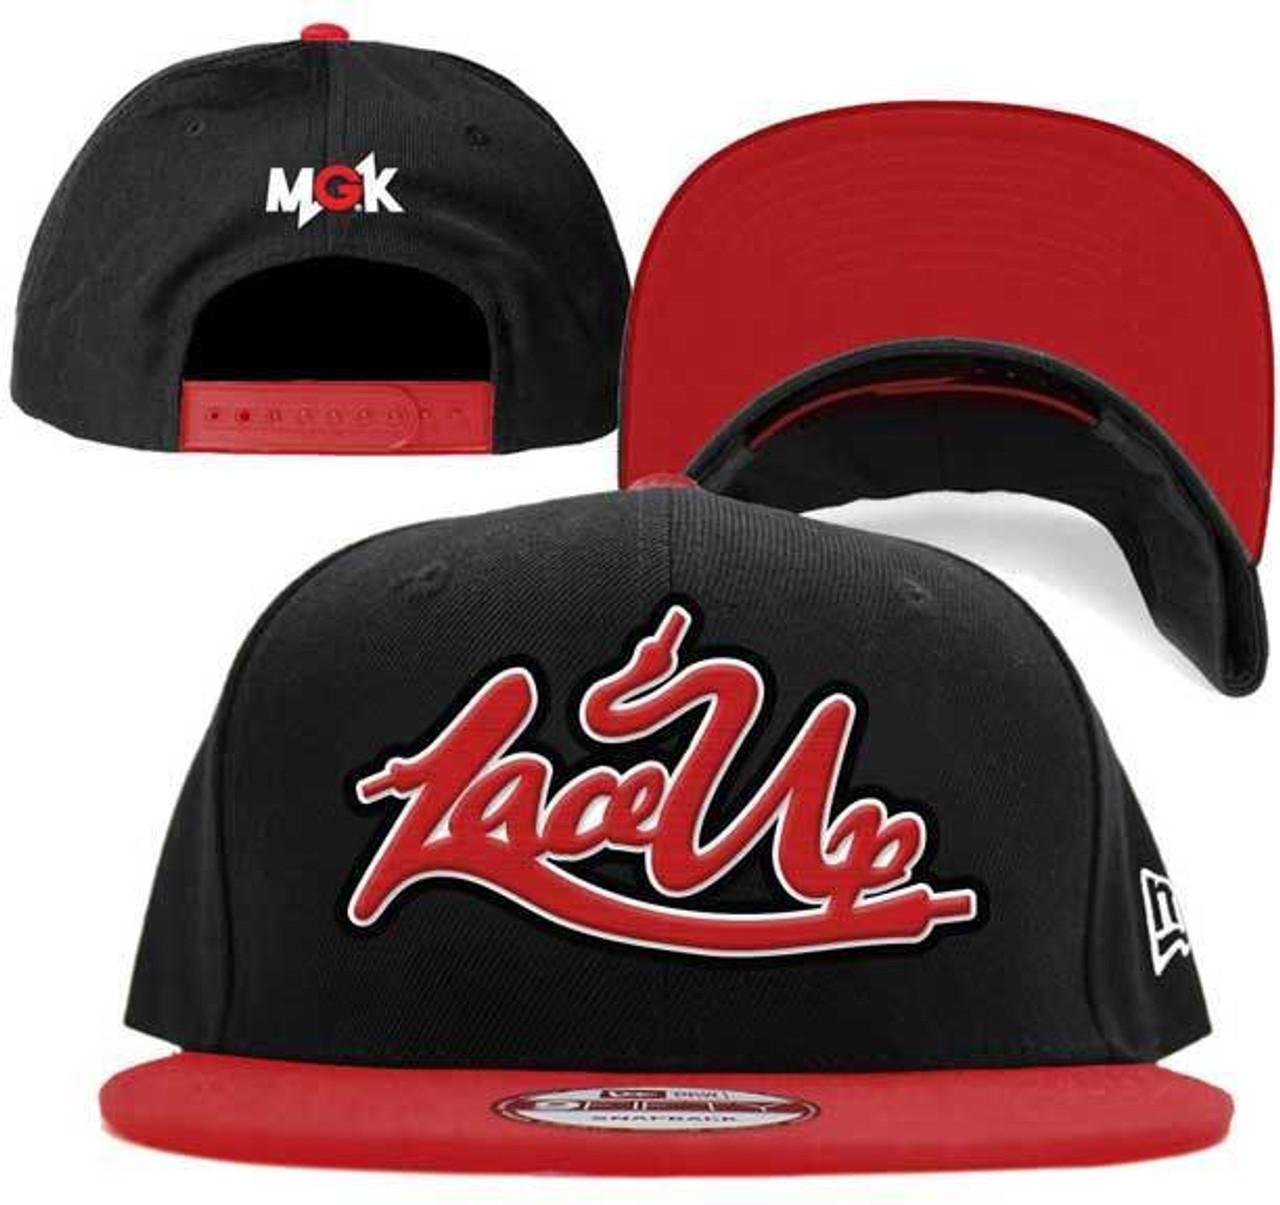 664ce860bff63 MGK Machine Gun Kelly Lace Up Hip Hop Rap Snapback Baseball Cap Hat  3398101H00 - Fearless Apparel